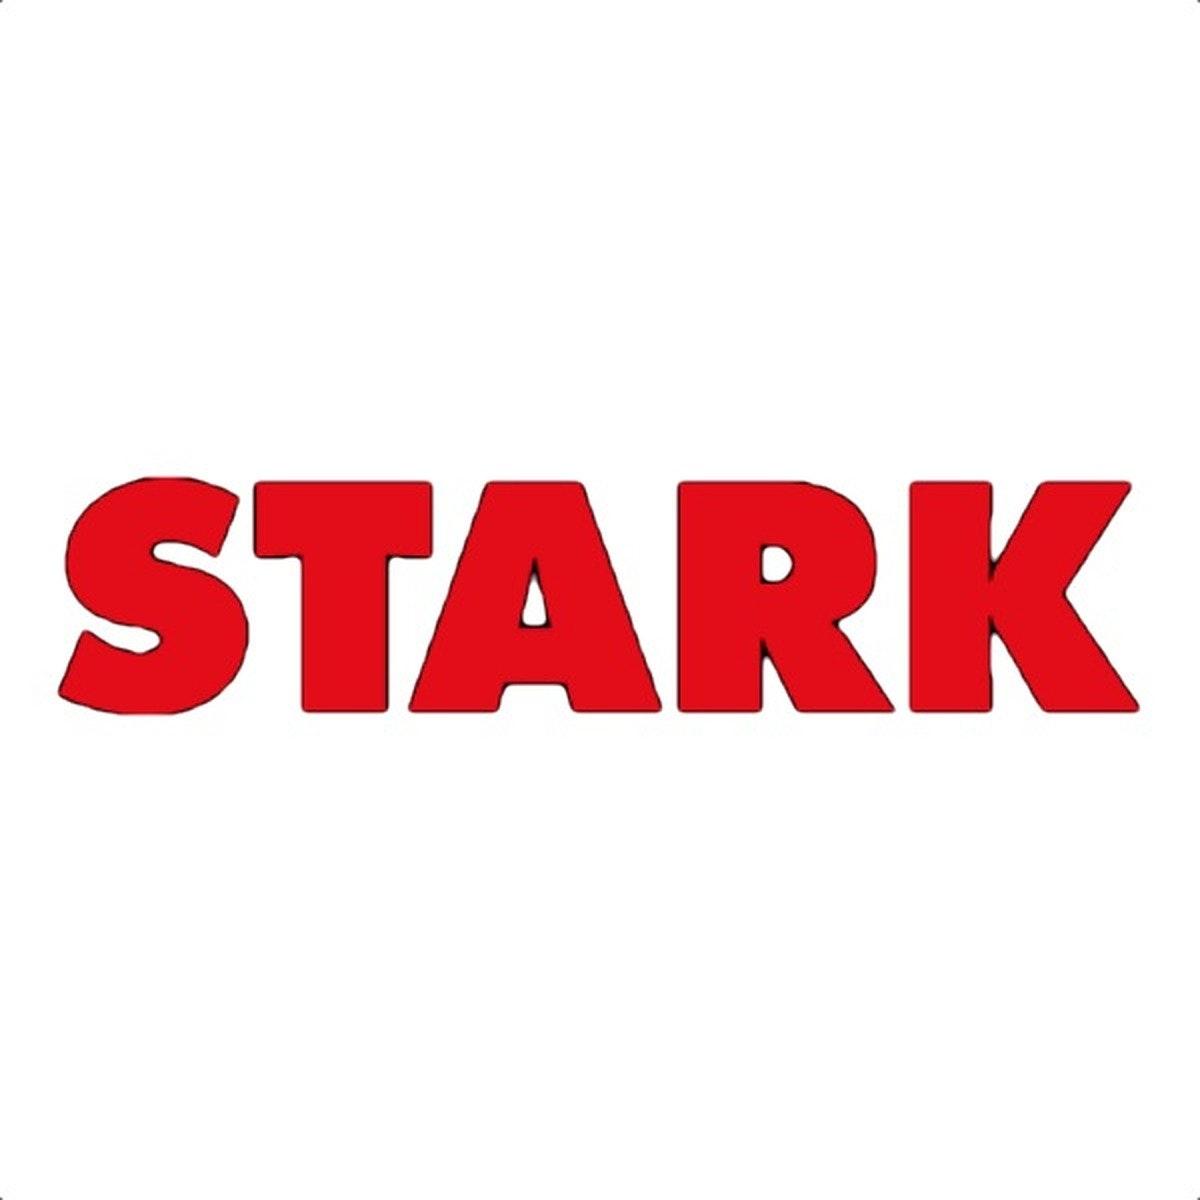 Stark Verlag GmbH